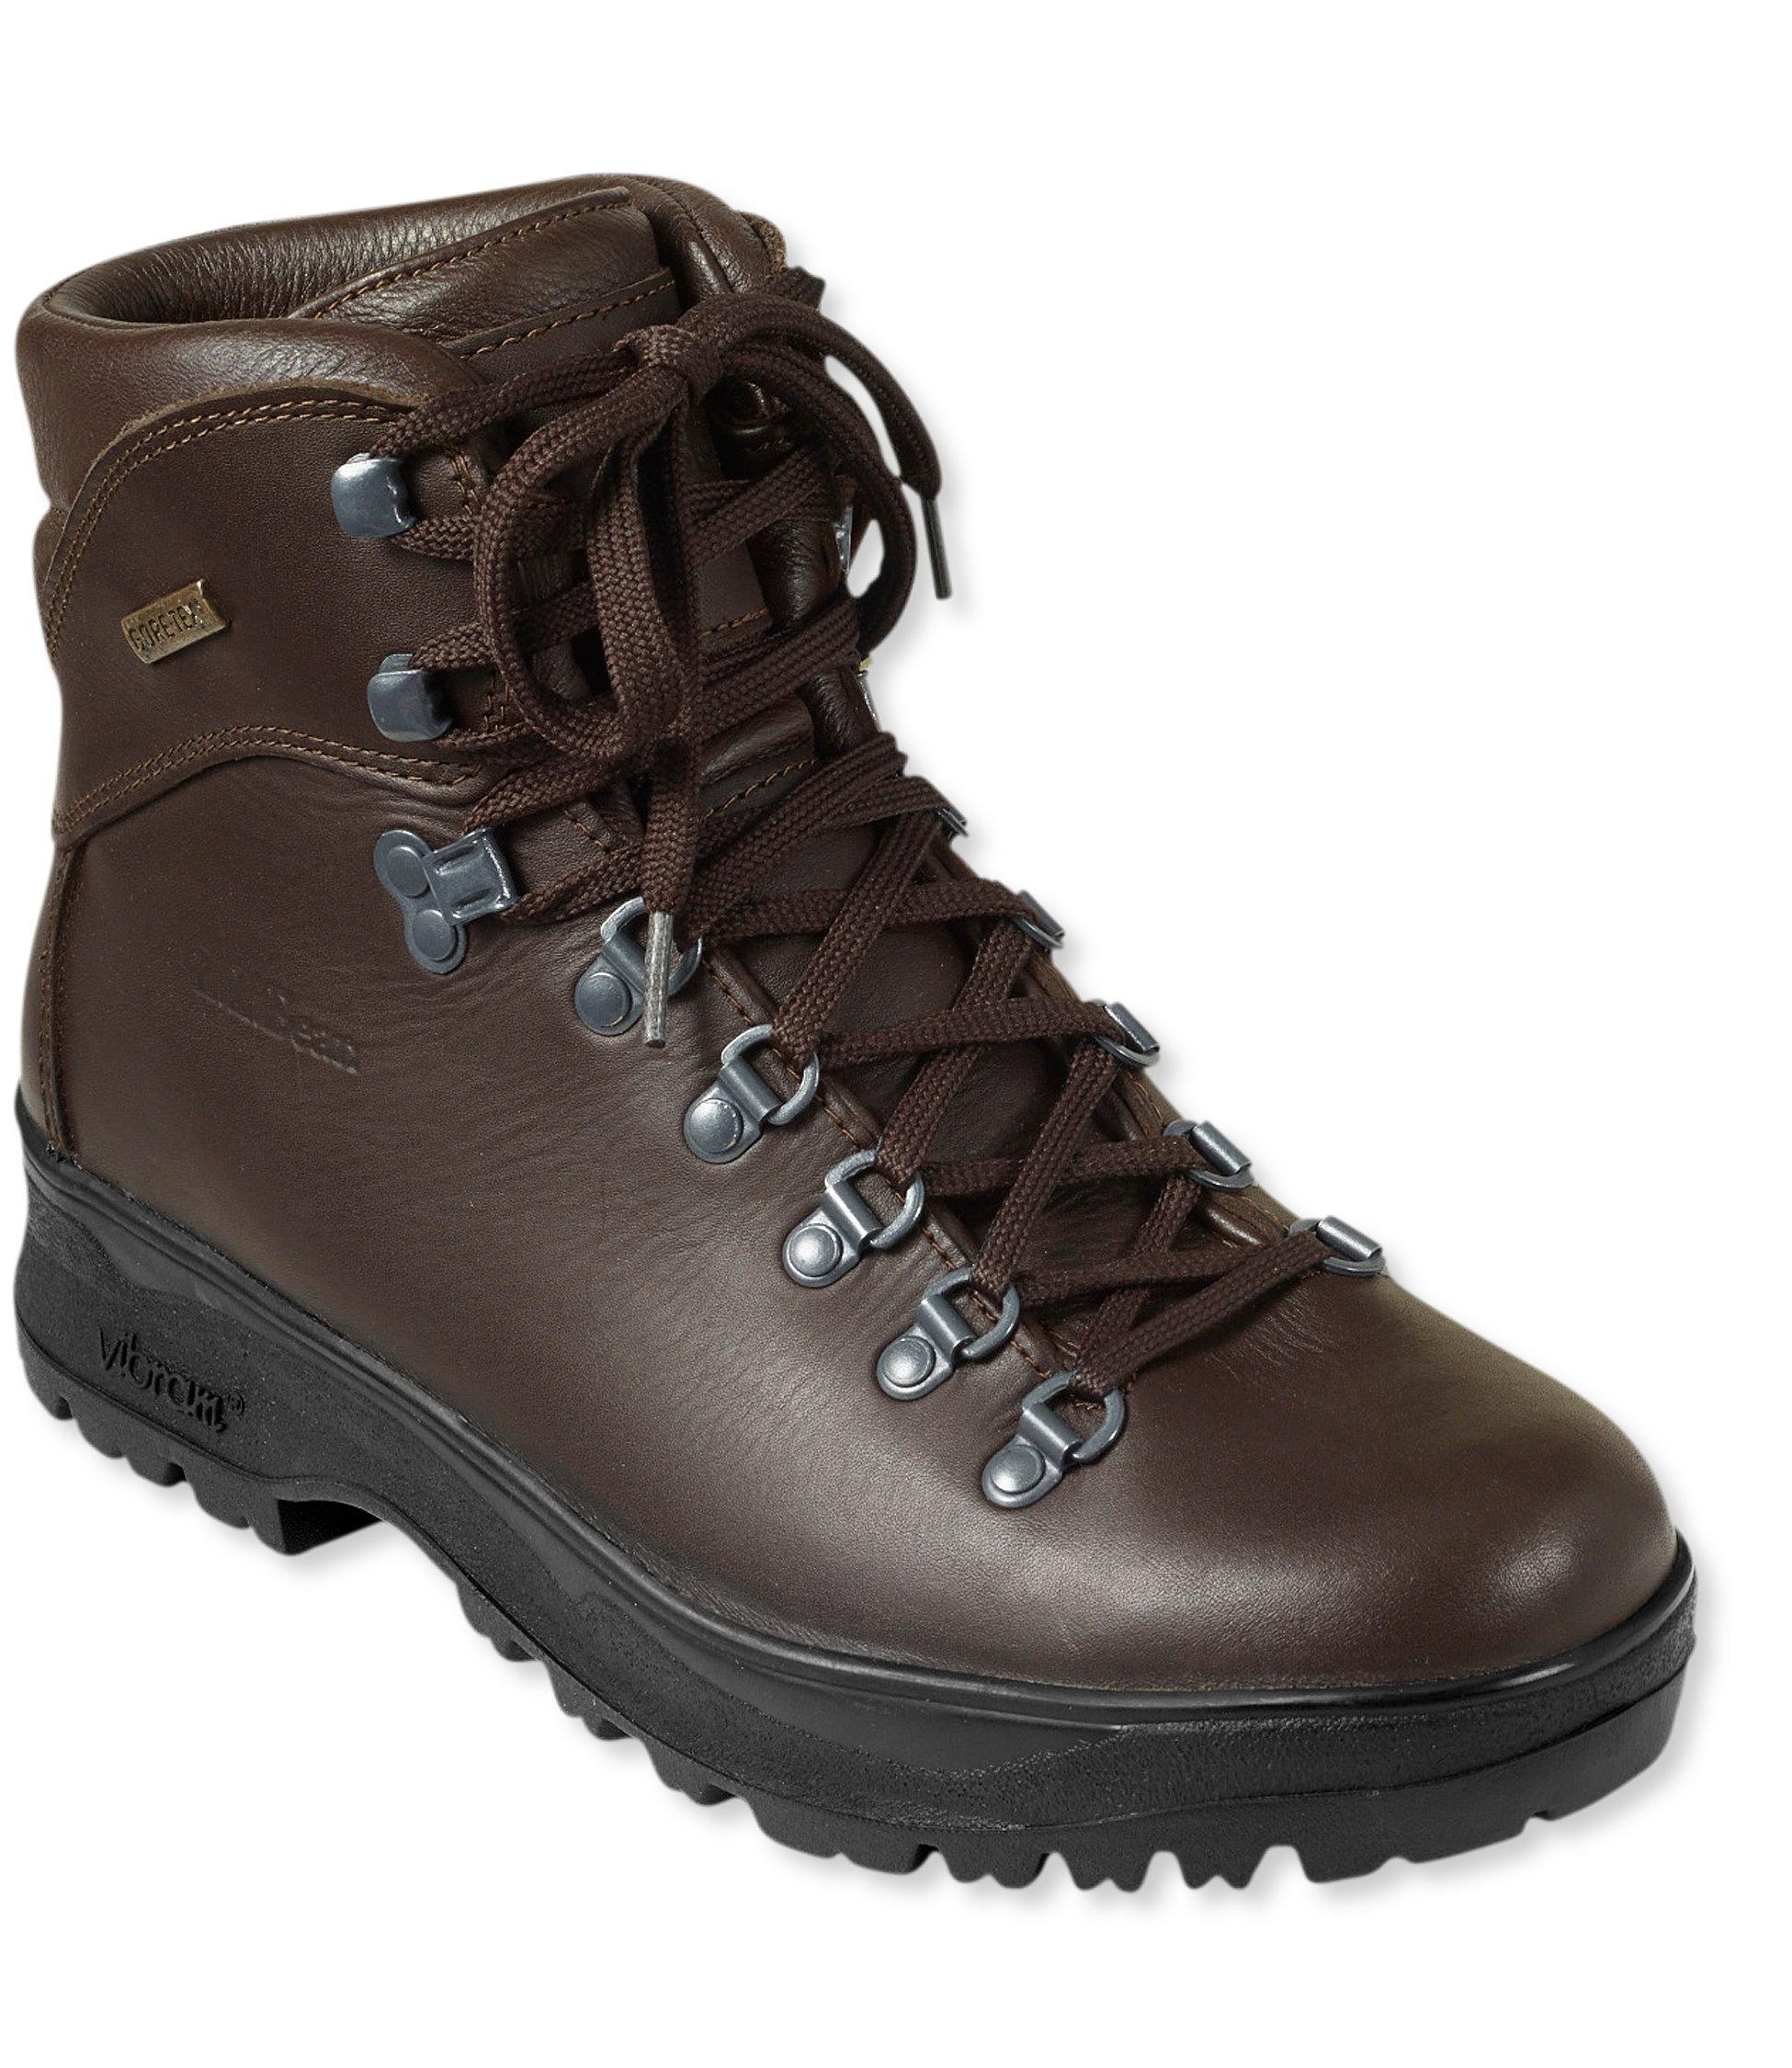 L L Bean Gore Tex Cresta Hikers Leather Reviews